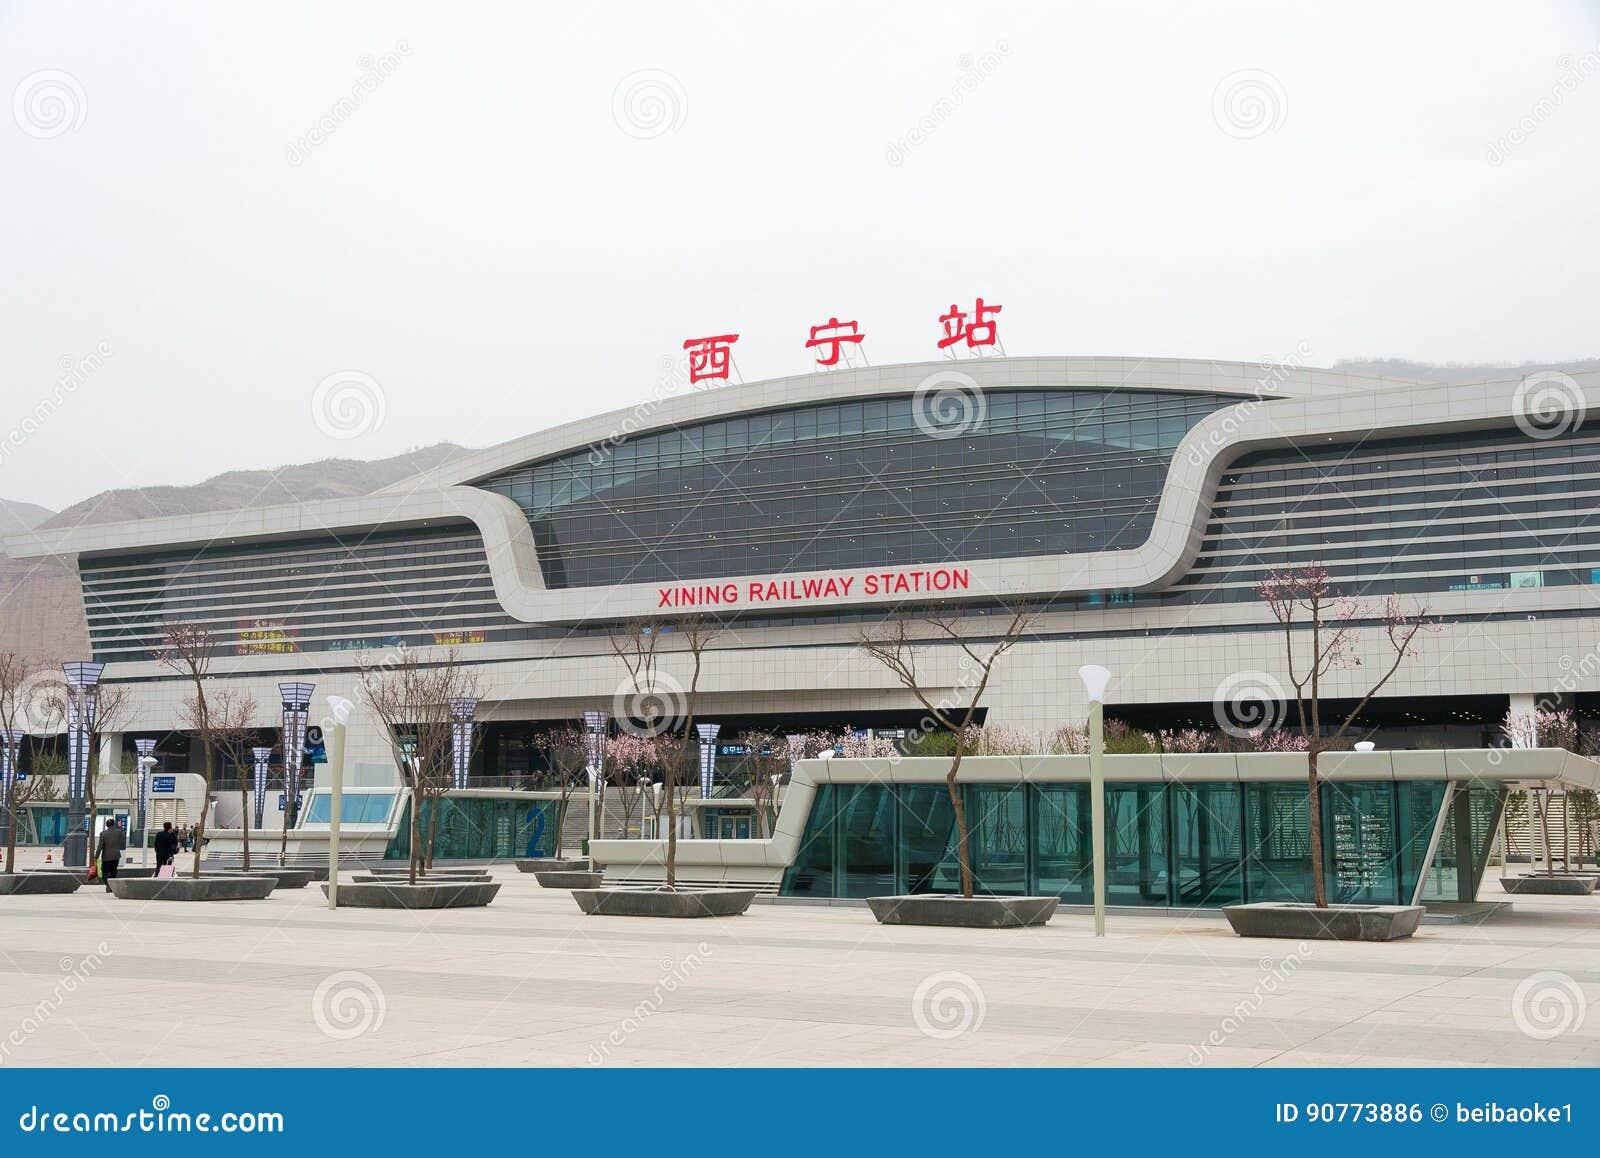 QINGHAI, CHINA - 4. April 2015: Bahnhof Xinings in Xining